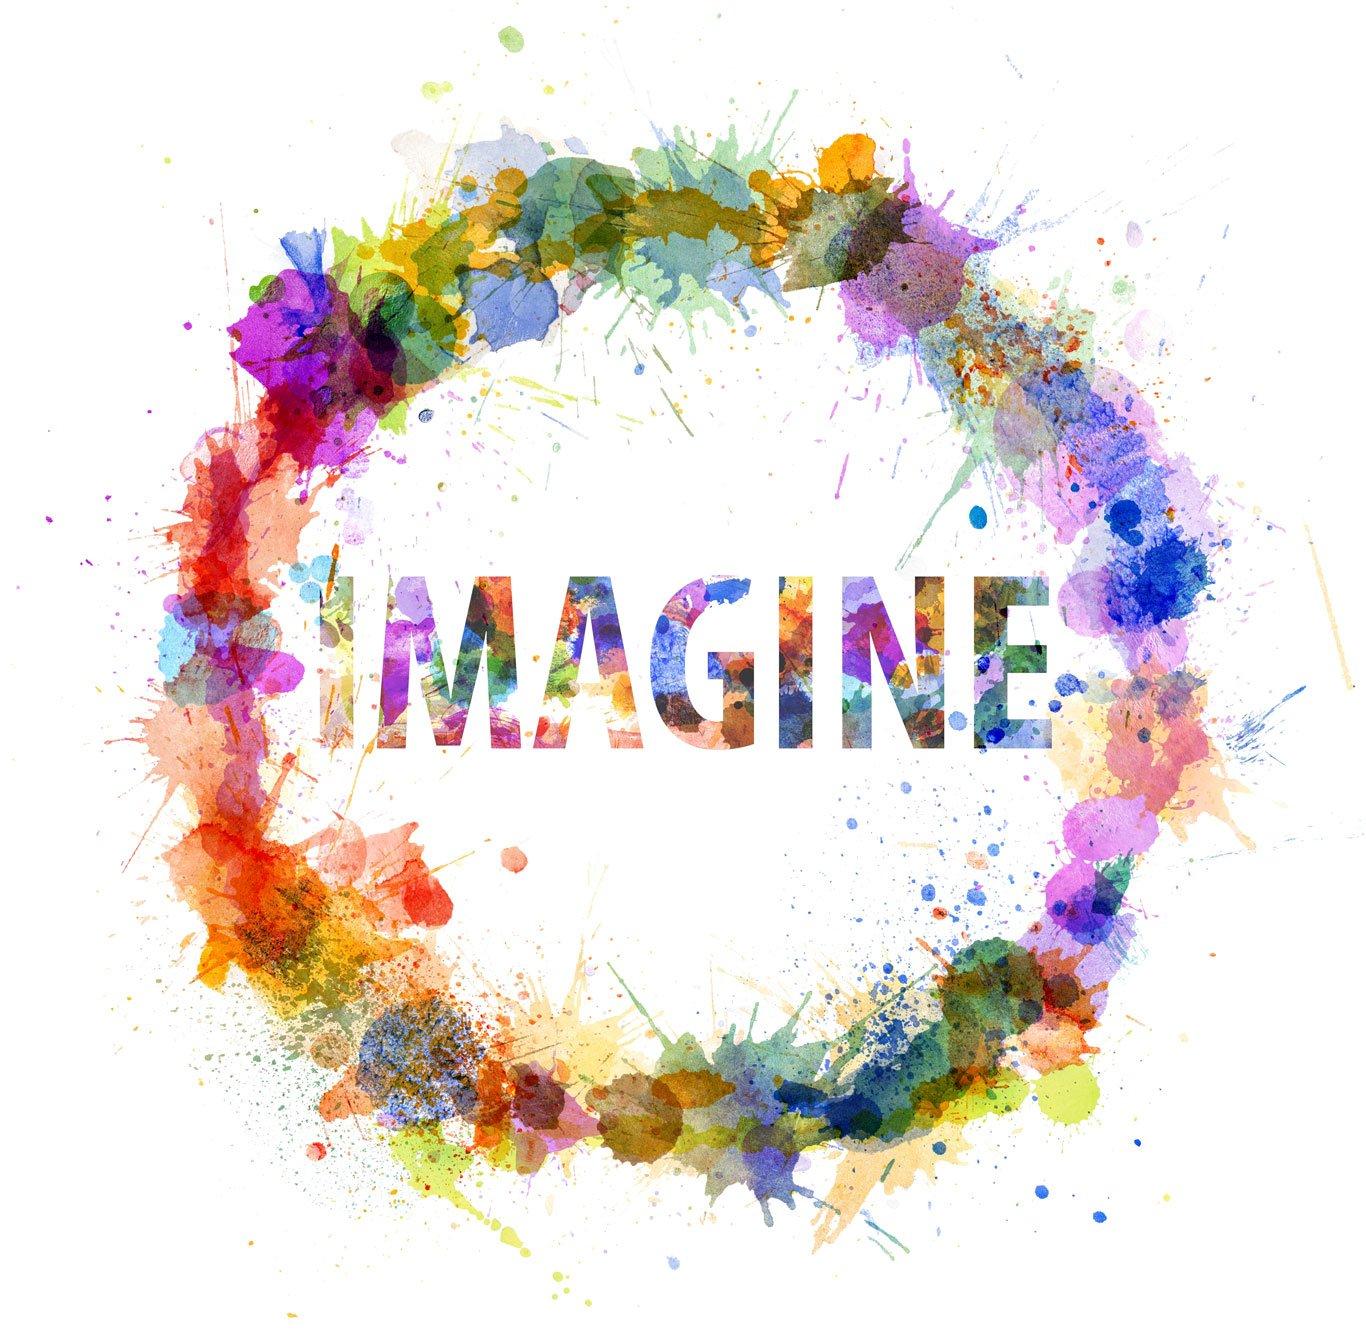 Arts-Imagine-1366-0619